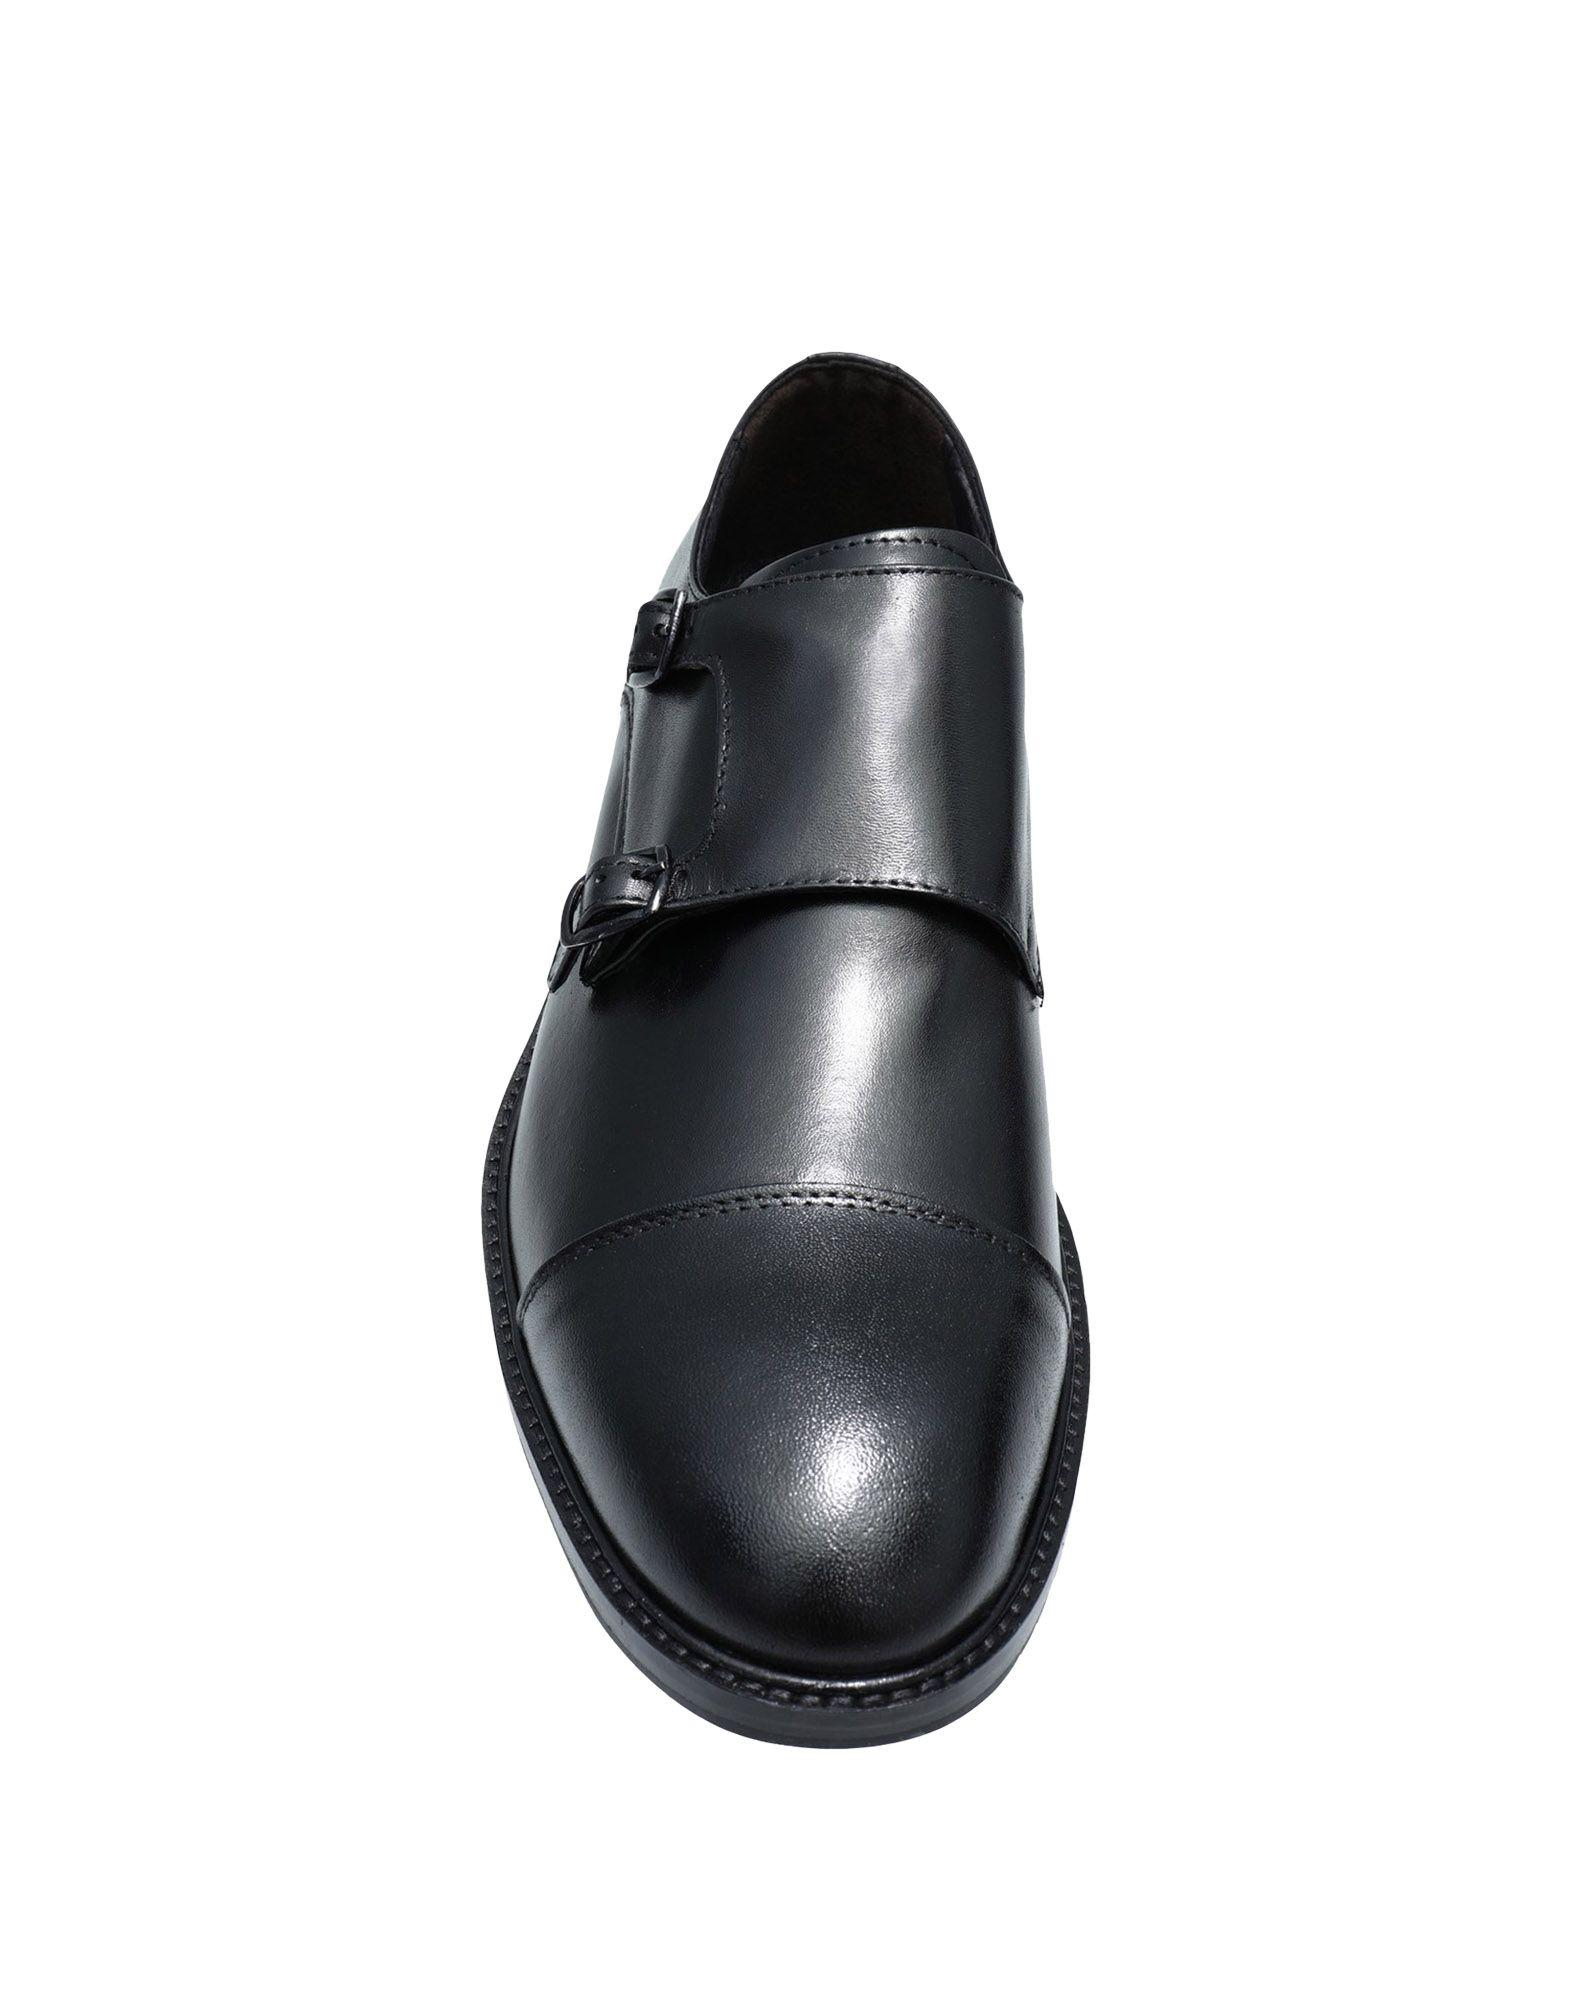 Rabatt echte Schuhe Antony 11536877UM Sander Mokassins Herren  11536877UM Antony 8056e6